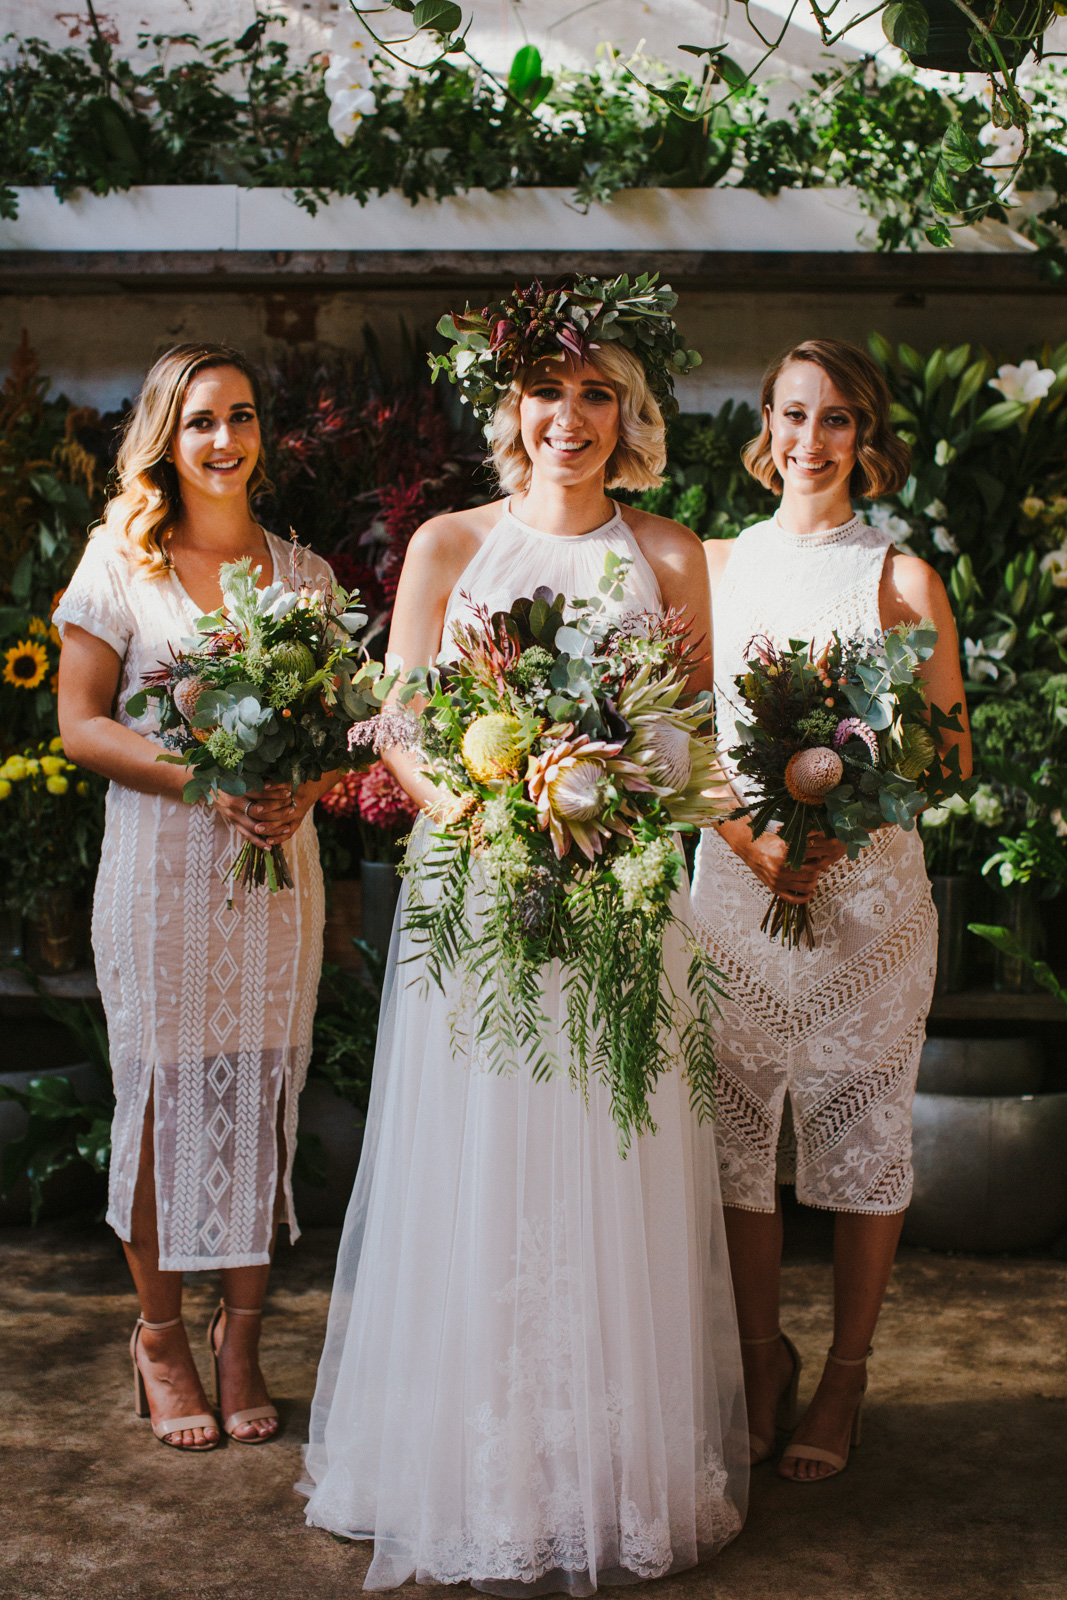 D+S-Melbourne Wedding Photographer-Glasshaus-Dean Raphael-85.jpg